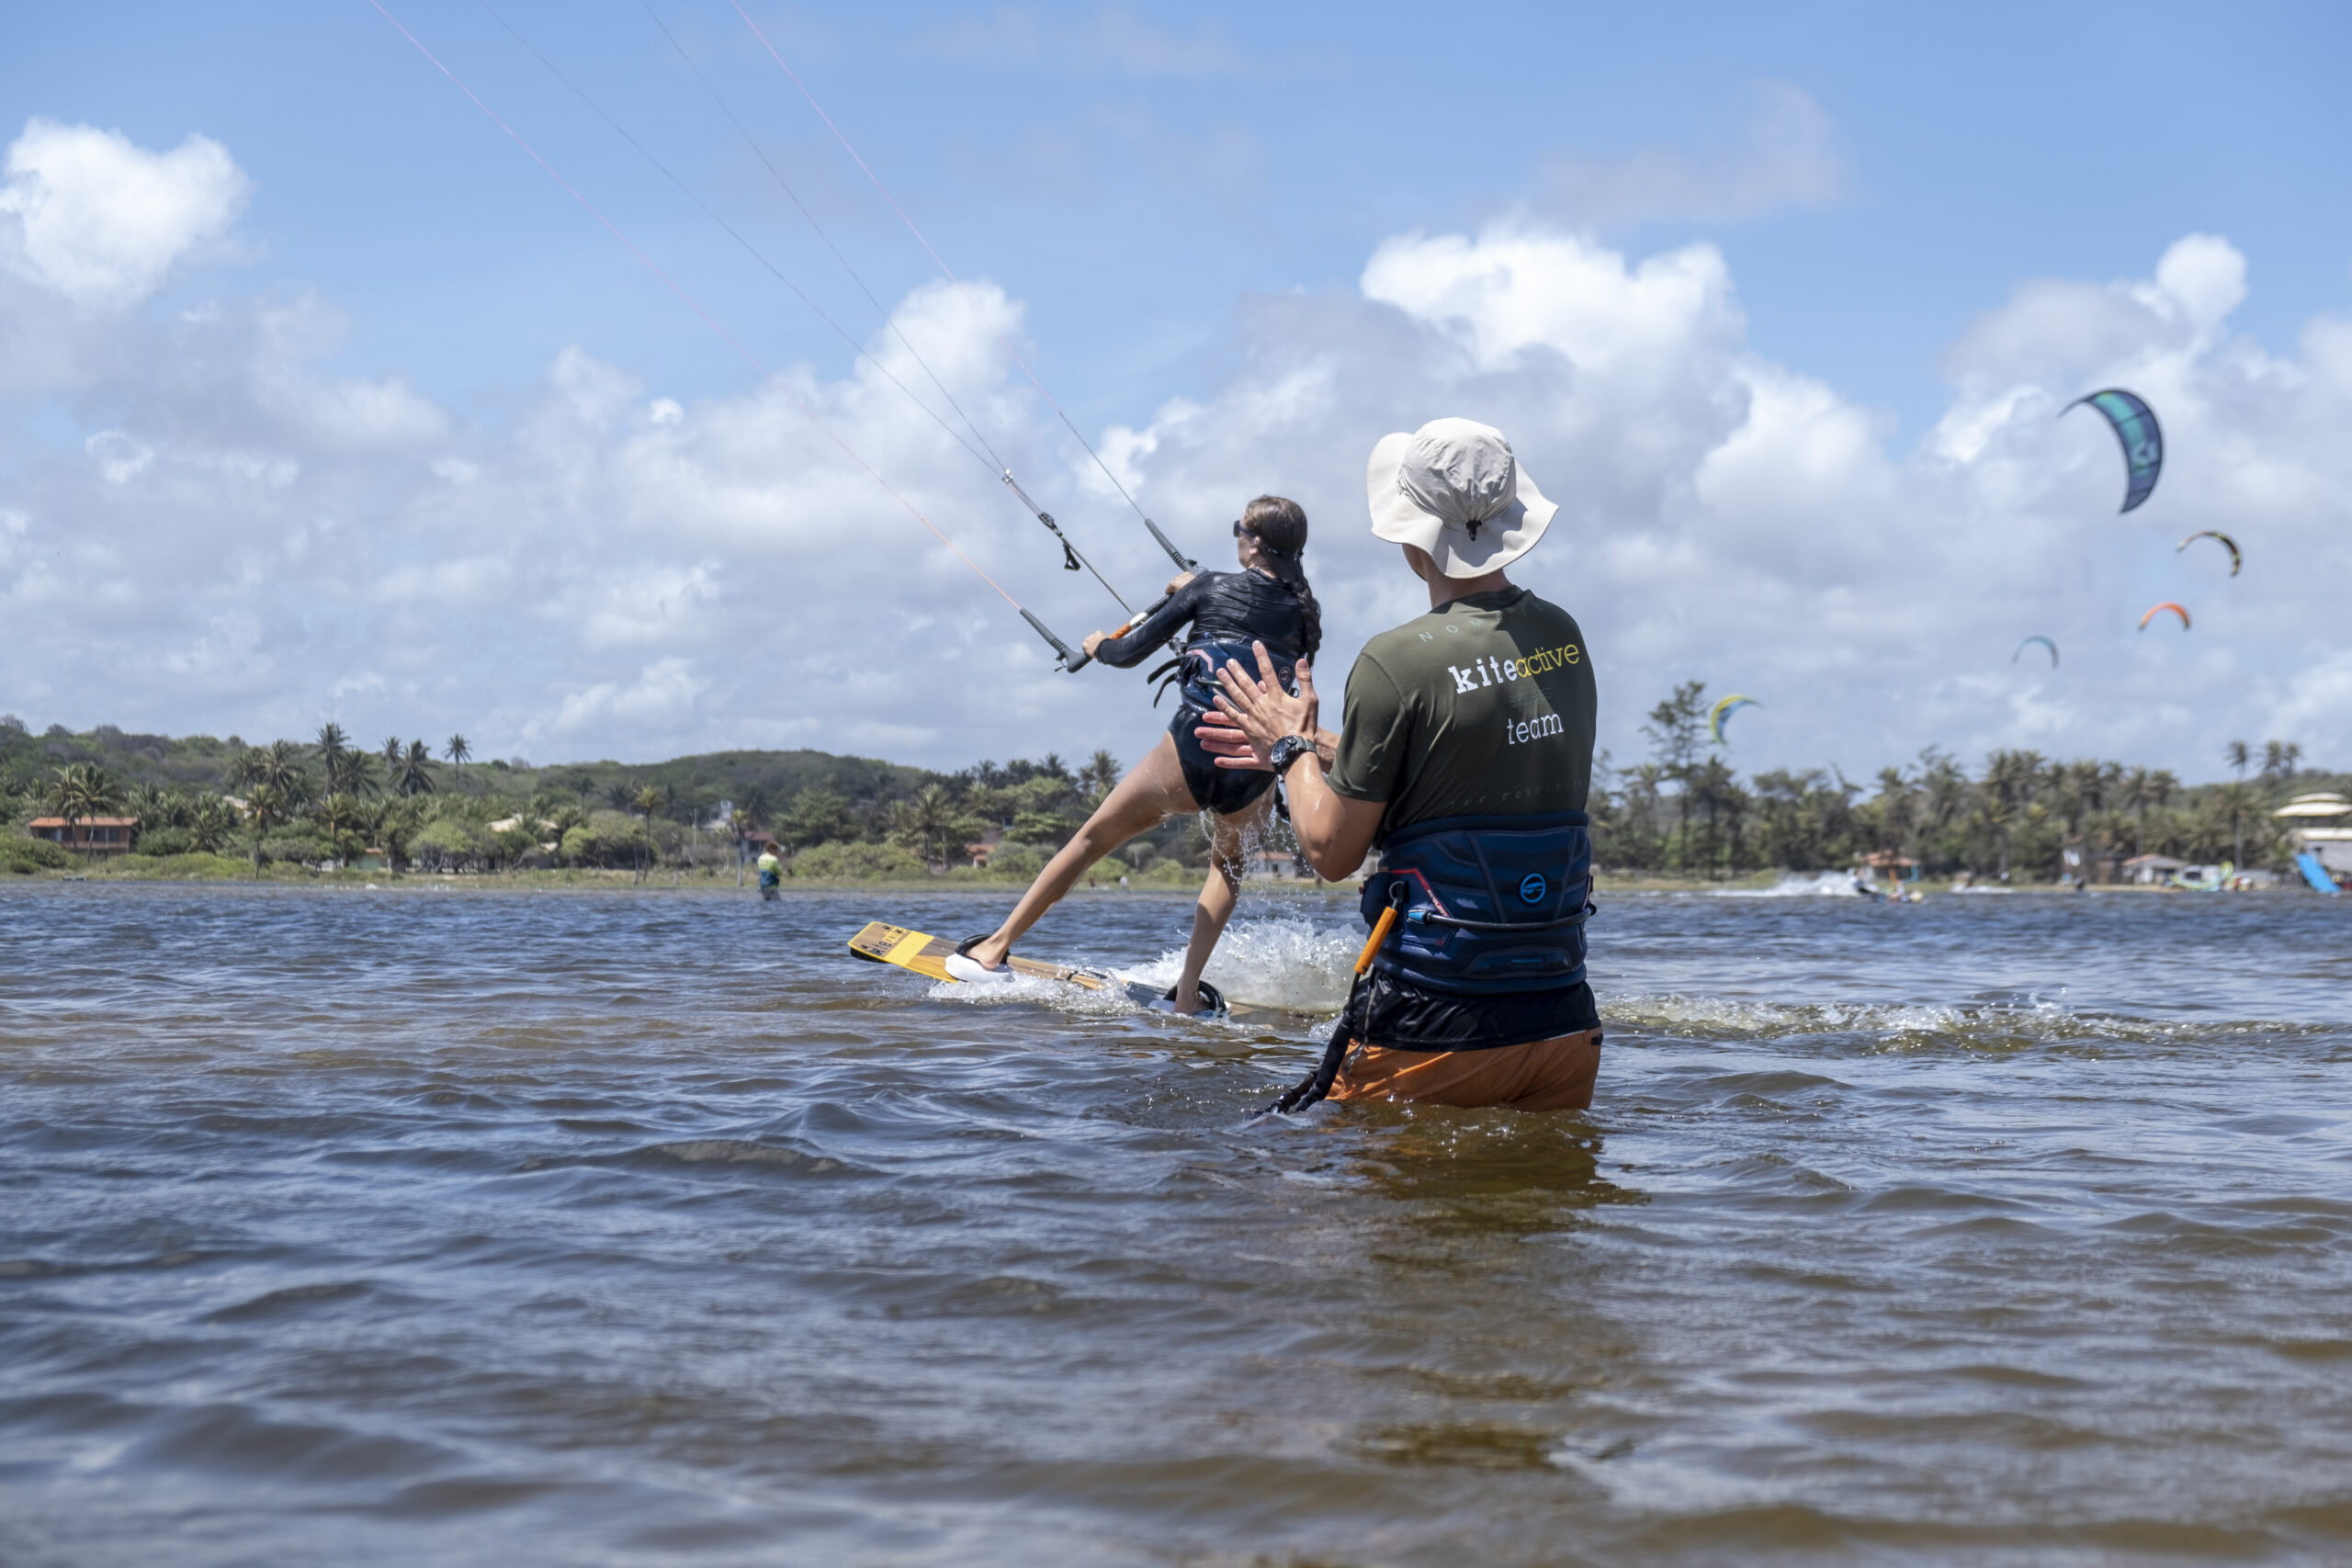 waterstart-learn-kitesurf